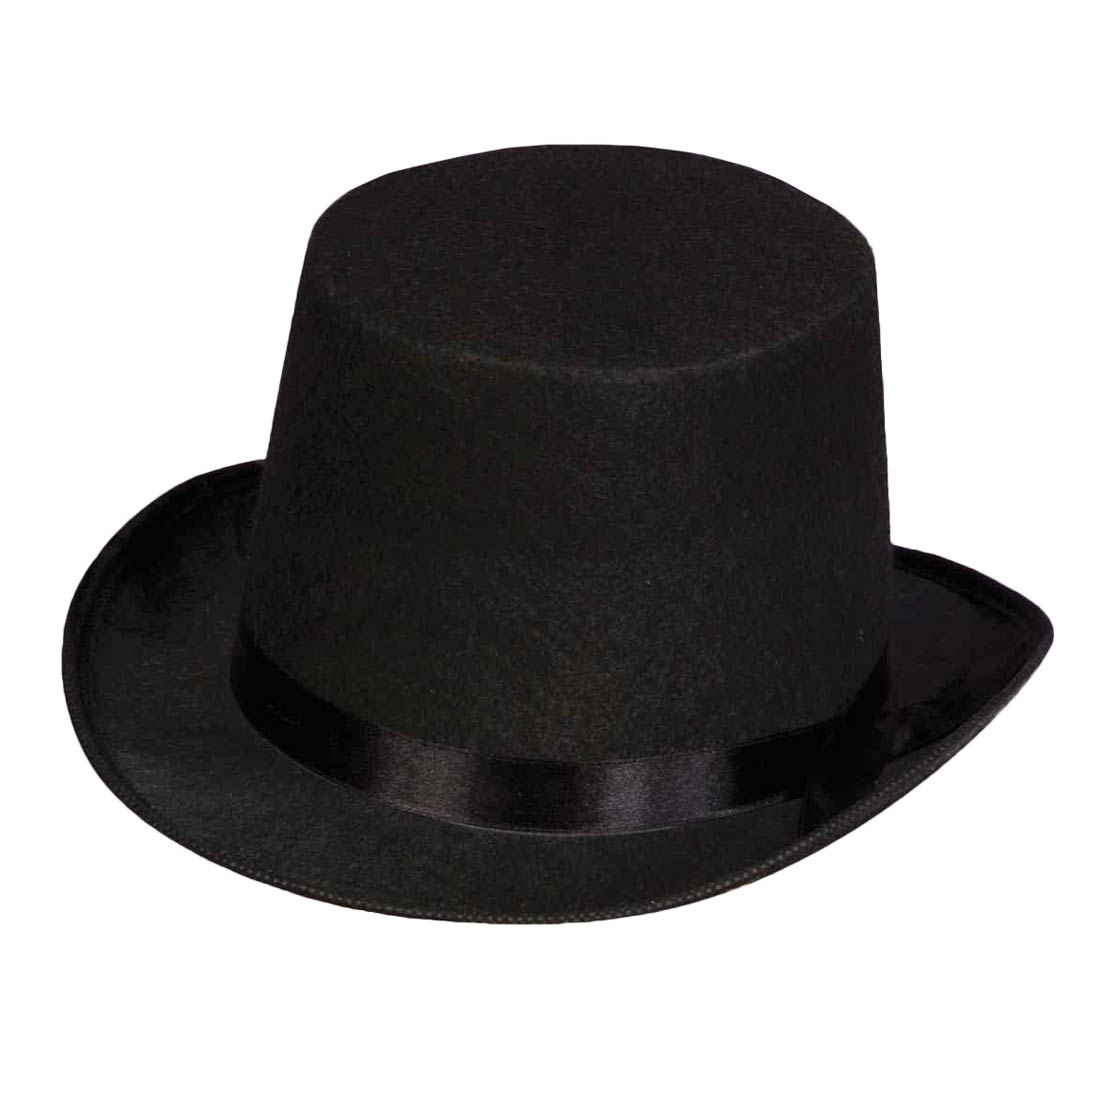 Top Hat Picture - ClipArt Best